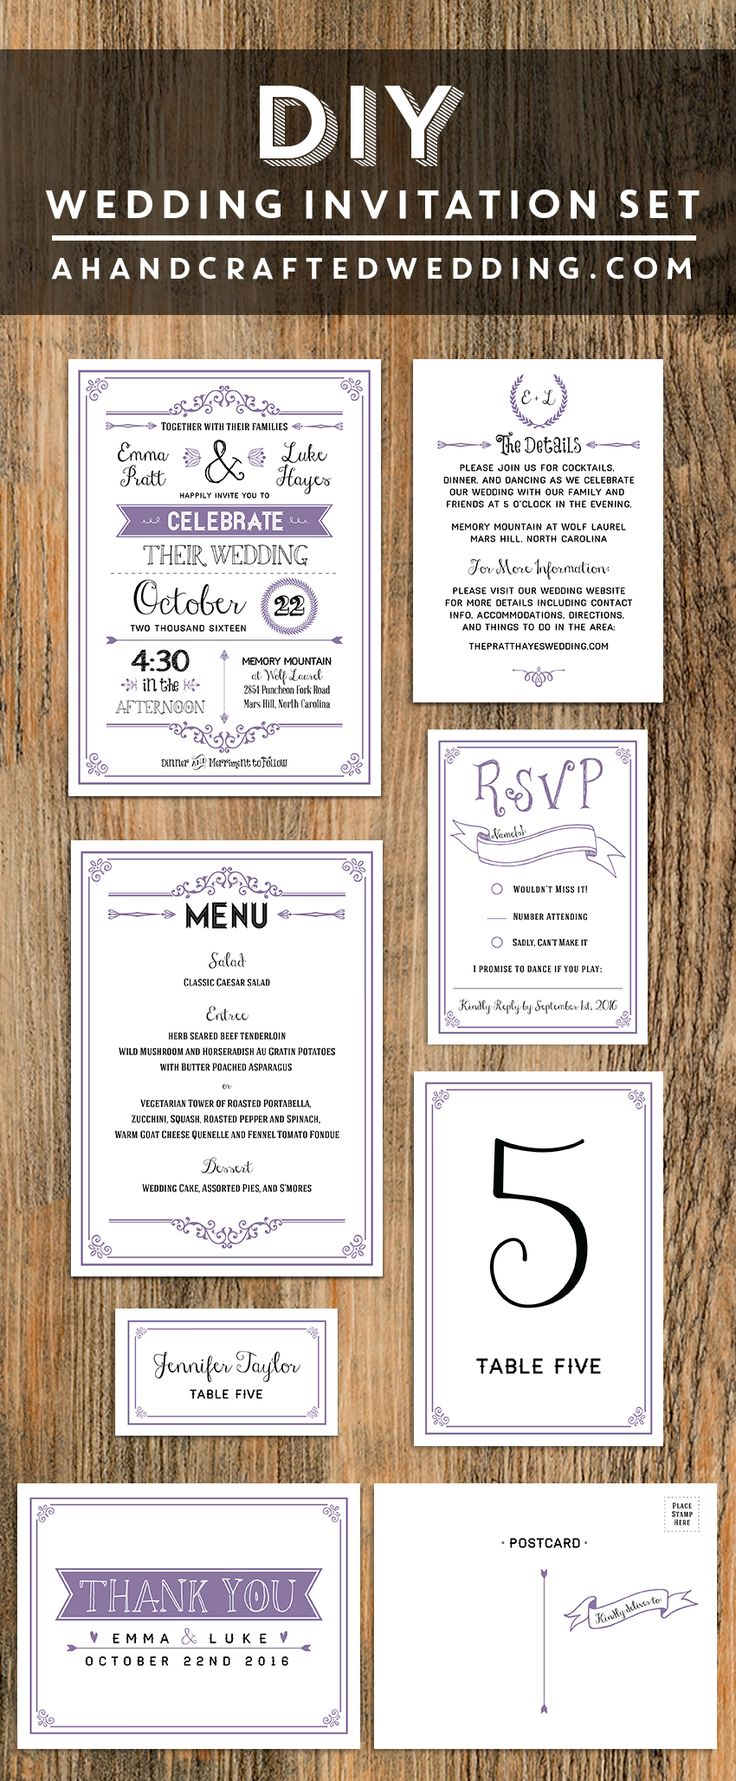 wedding invitations online au%0A Lavender DIY Wedding Invitation Set   ahandcraftedwedding com  printable   invitations